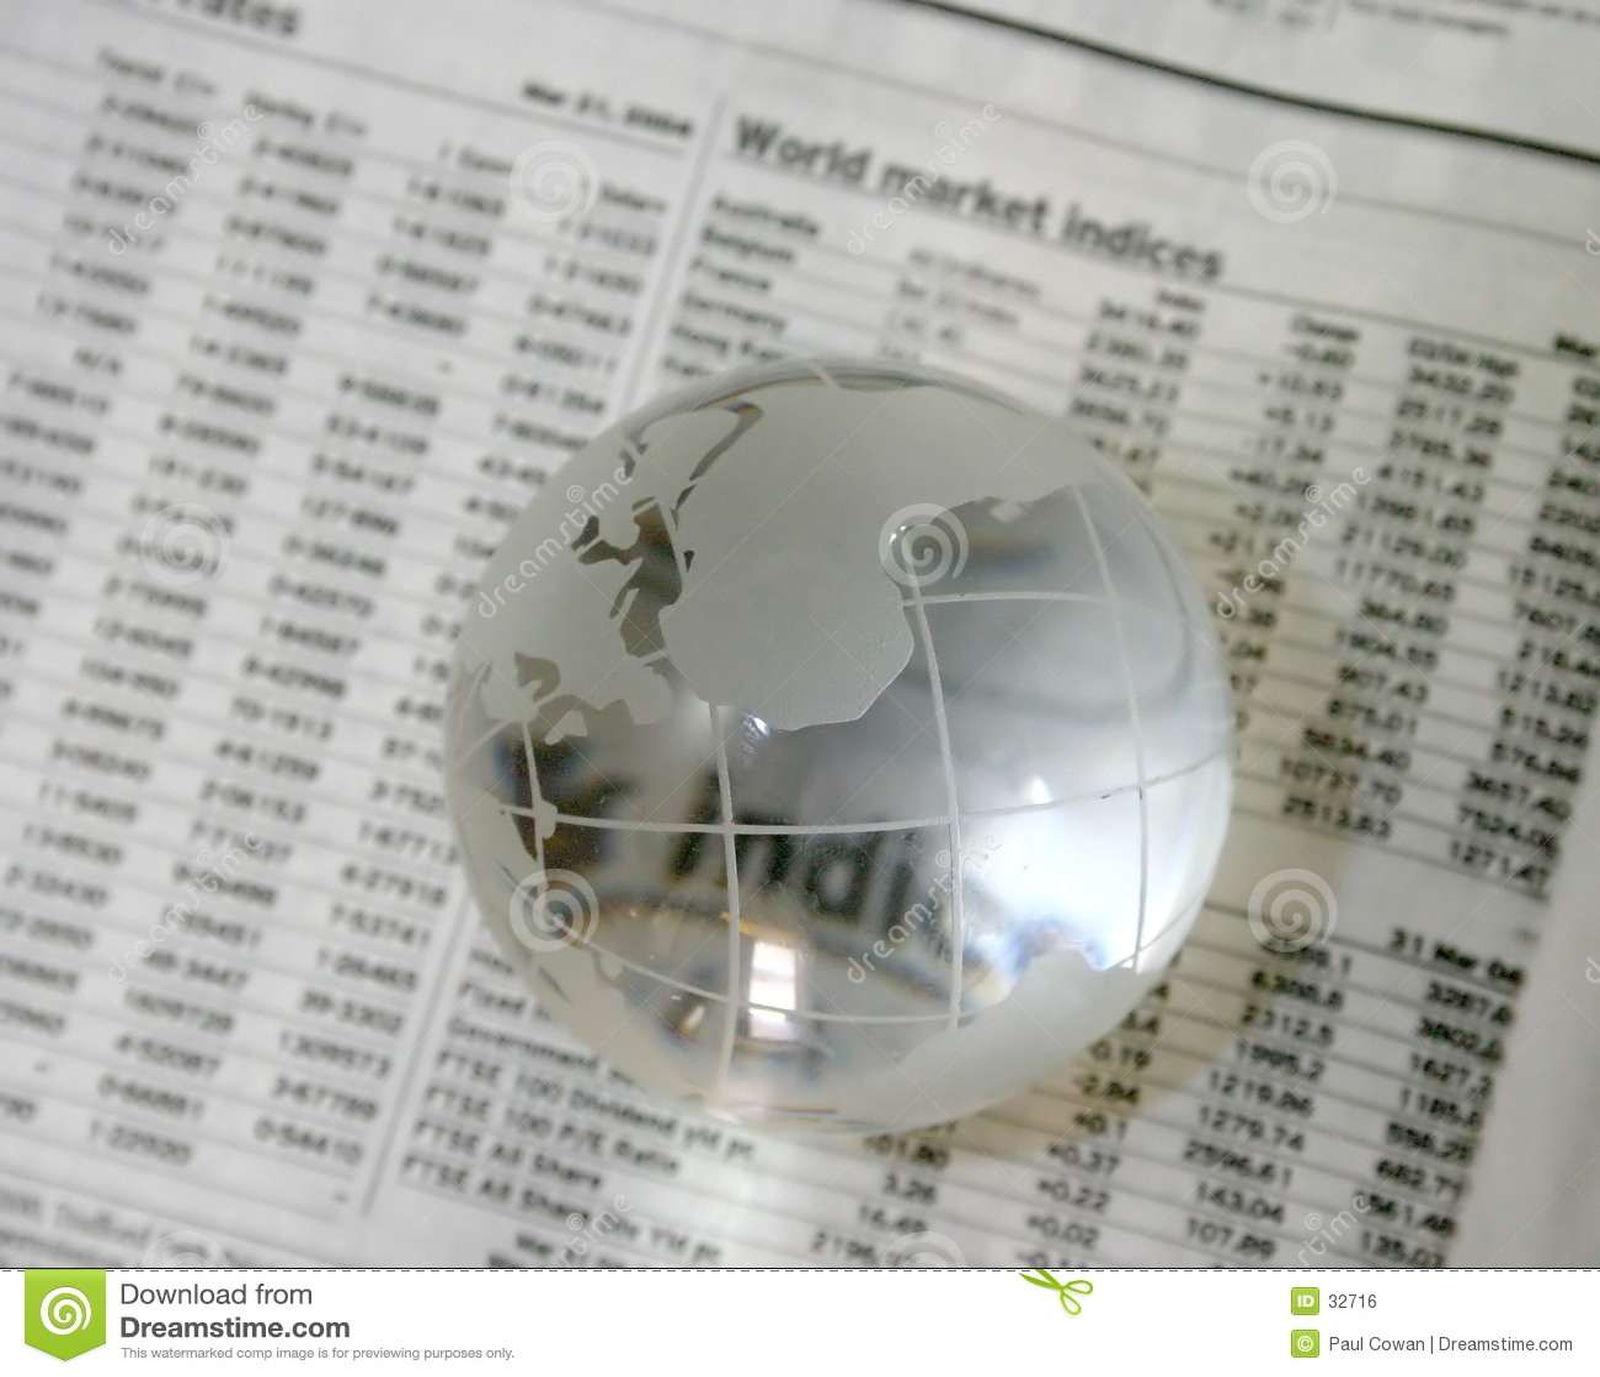 Global investor